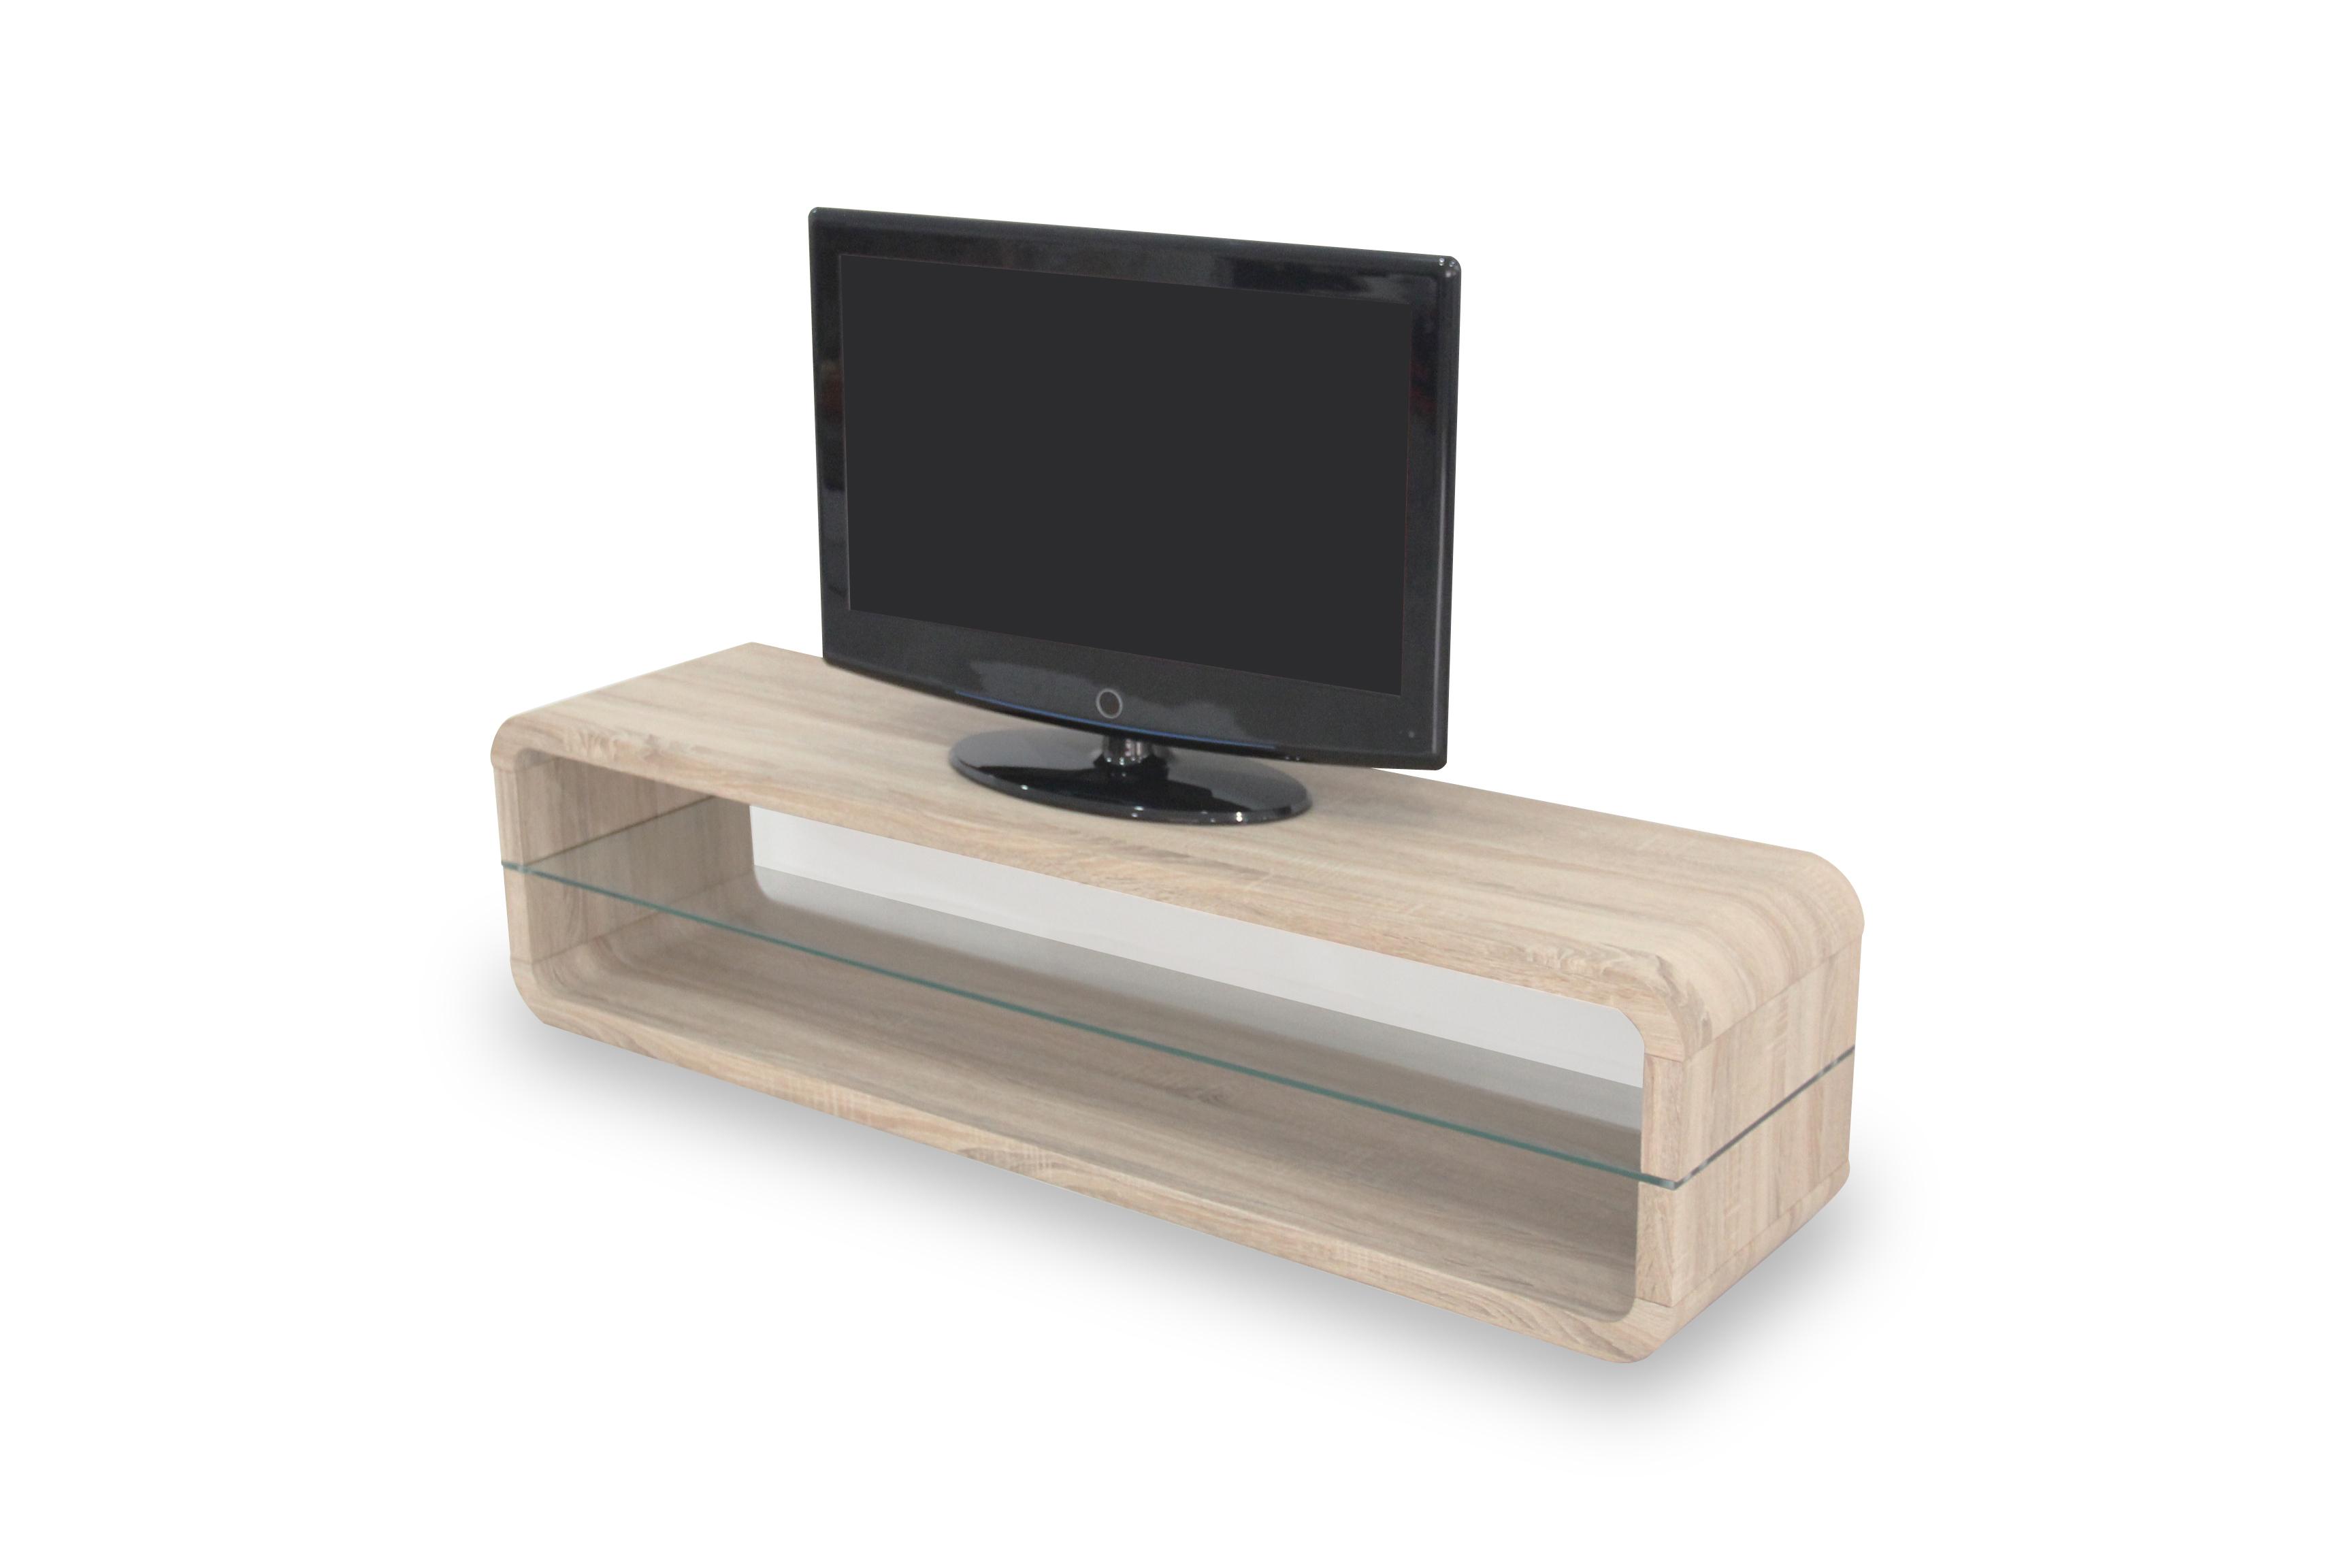 R 2100 Meuble Tv Lcd 140 Cm Ch Ne Sonoma Modiva # Meuble Tv Sonoma